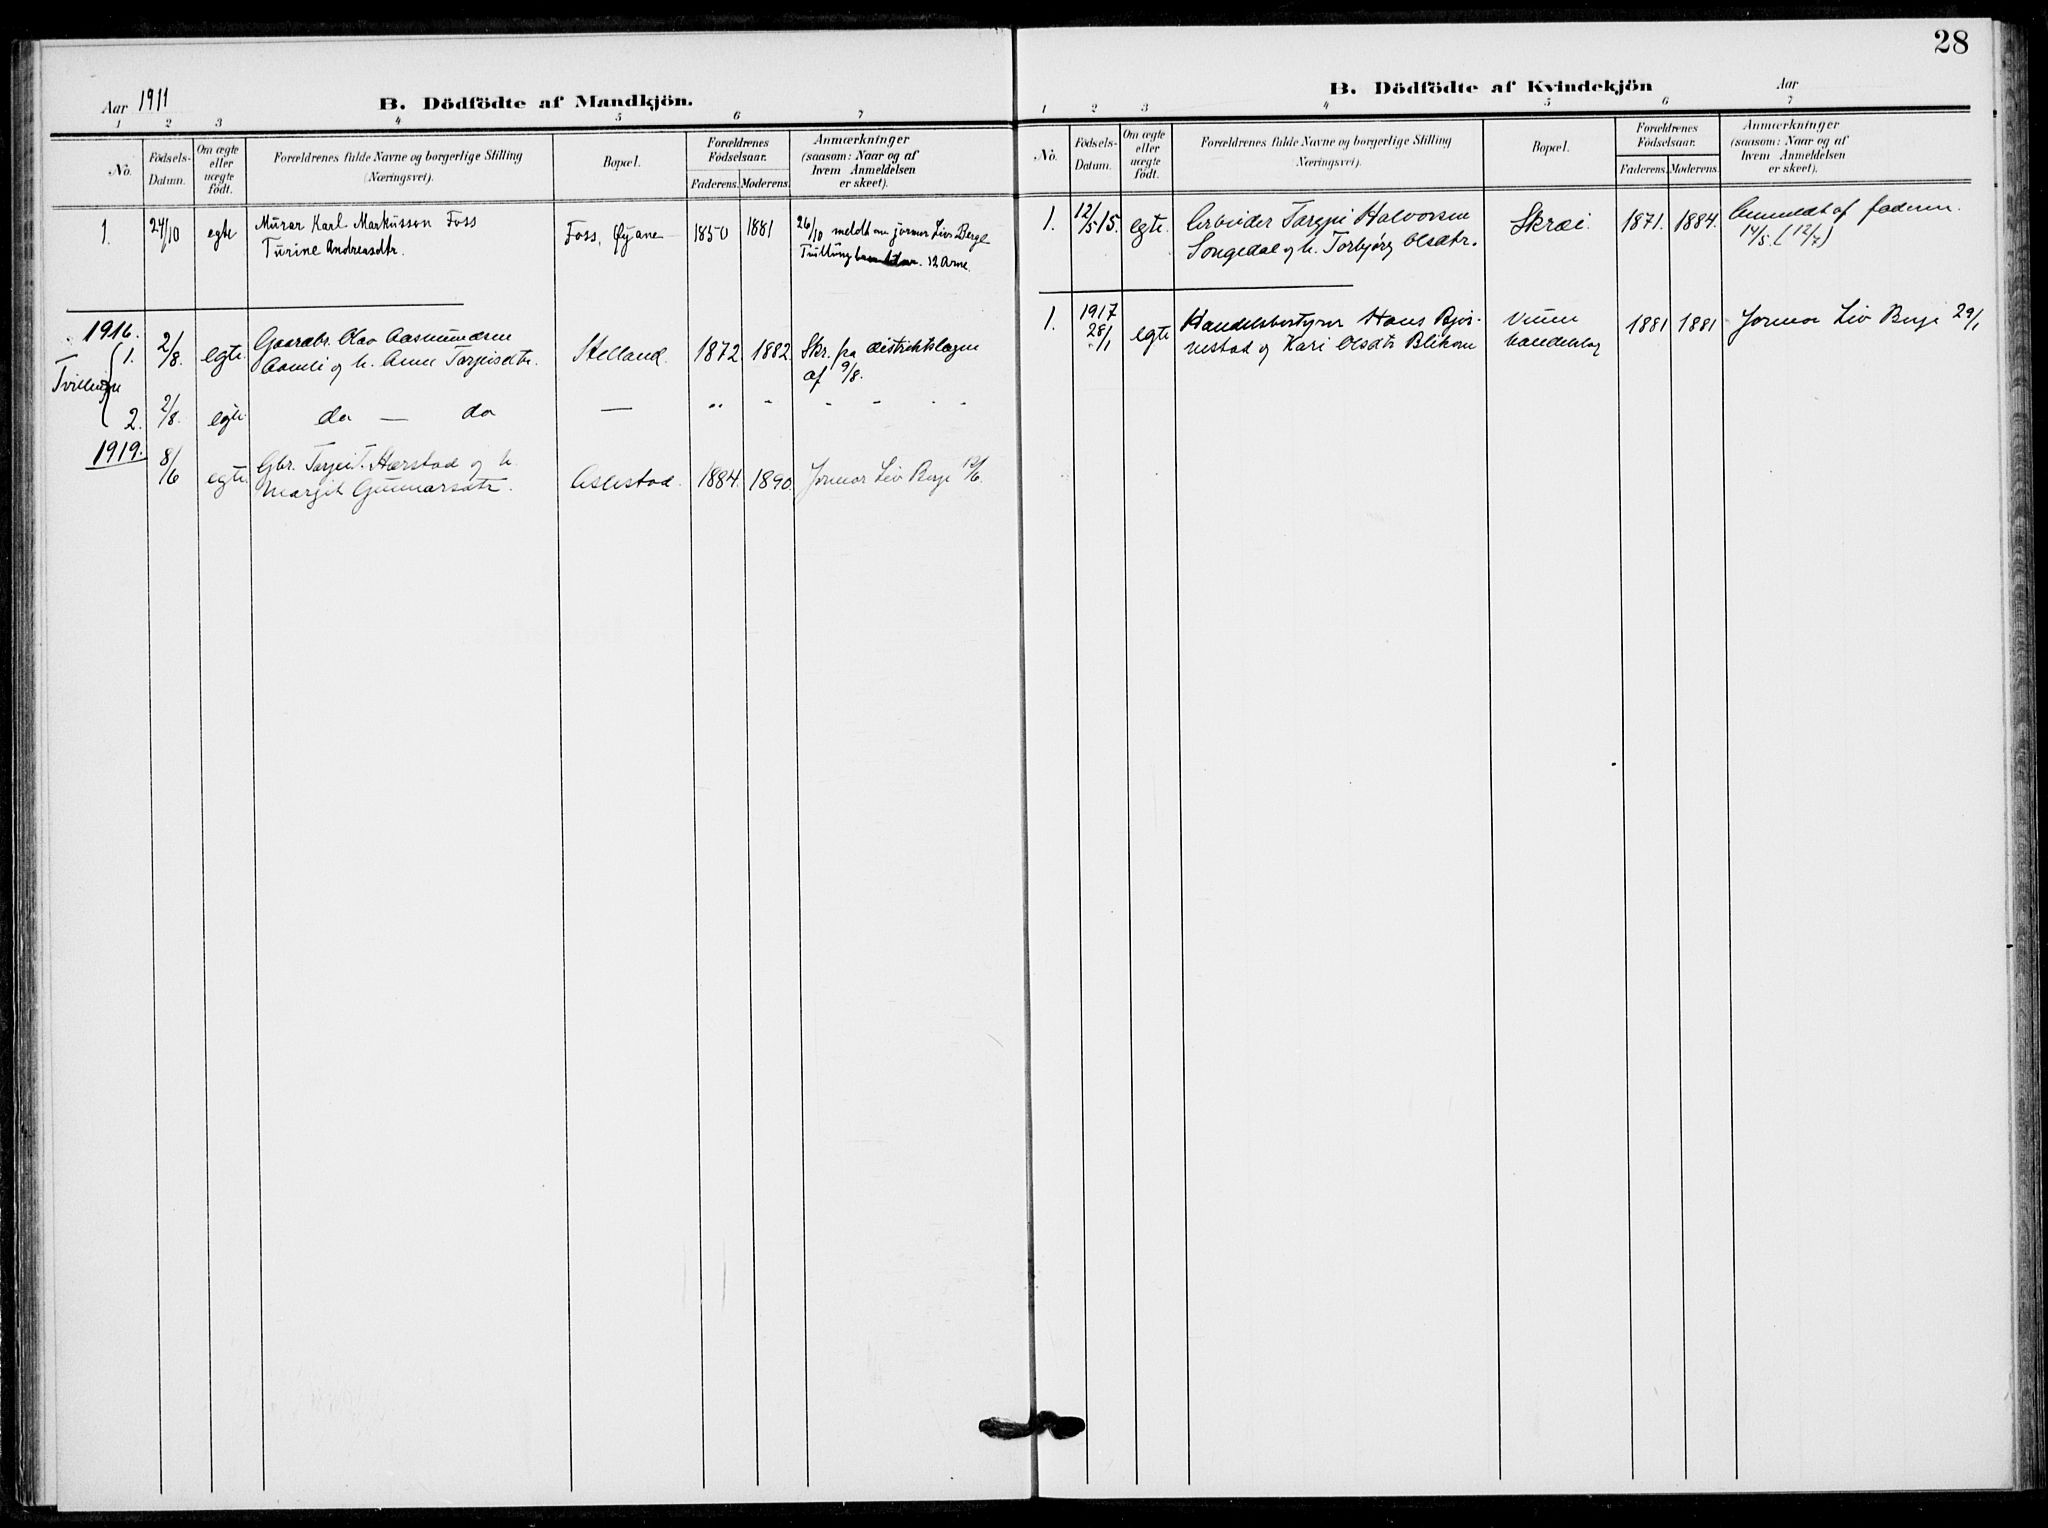 SAKO, Fyresdal kirkebøker, F/Fb/L0004: Ministerialbok nr. II 4, 1903-1920, s. 28